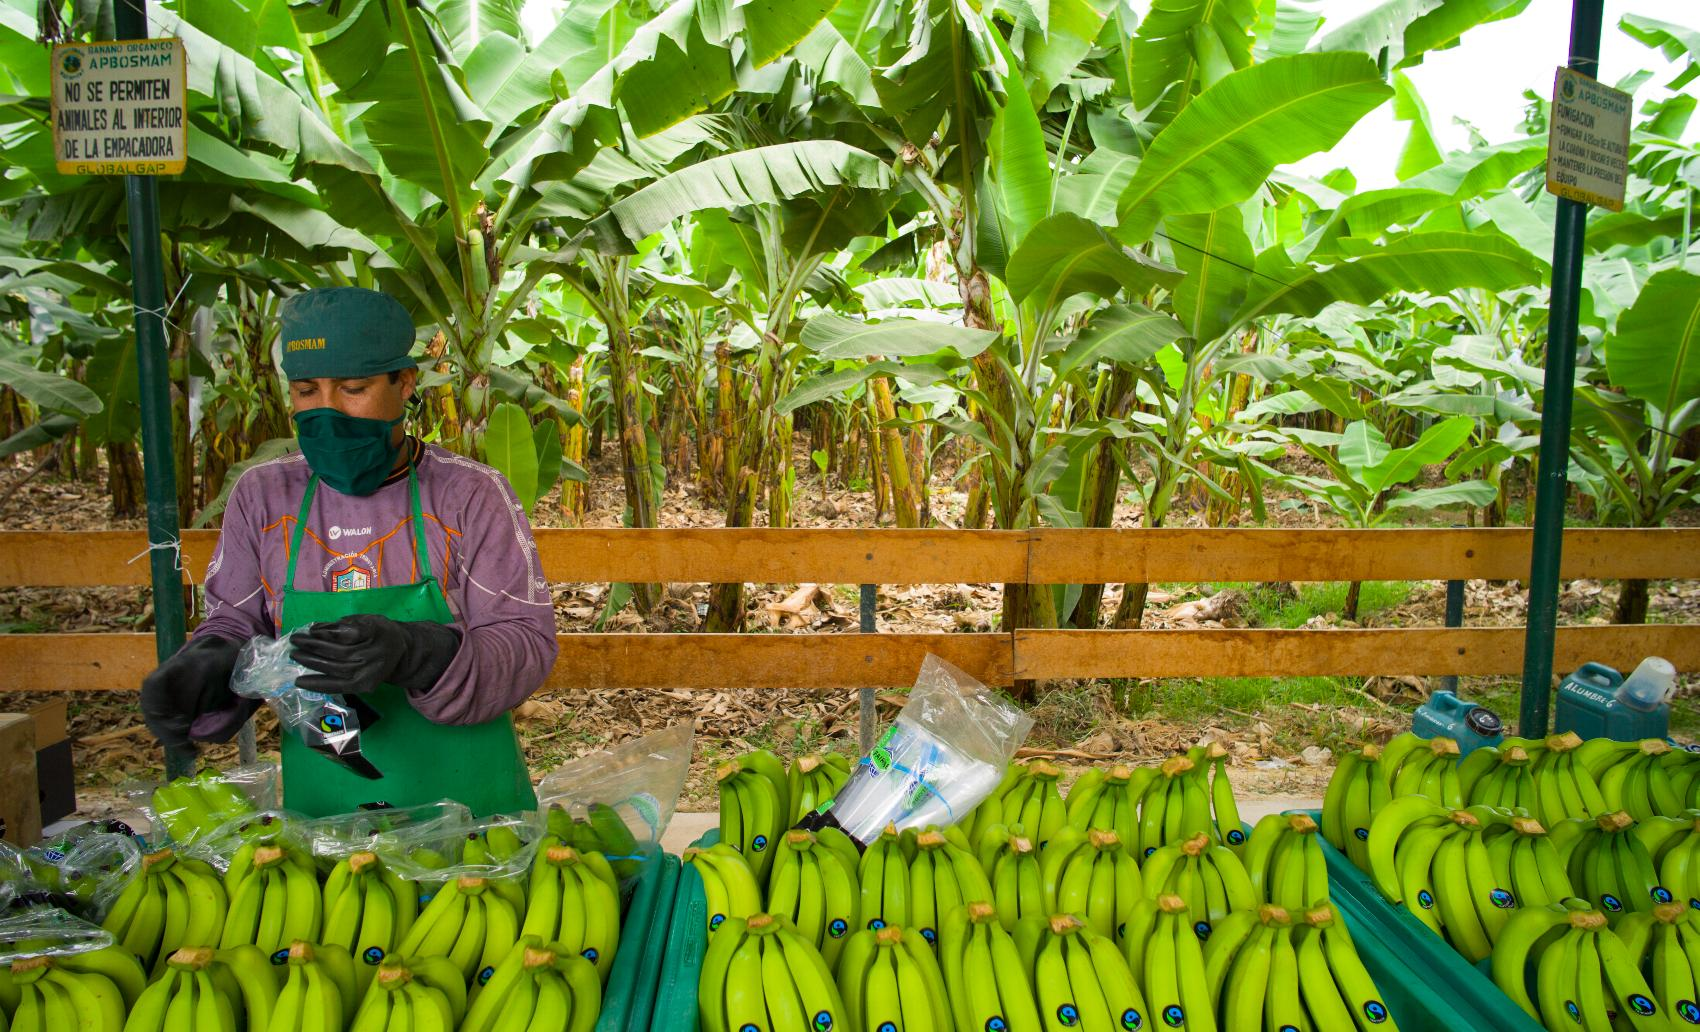 Bananenorganisation Peru Santiago Engelhardt